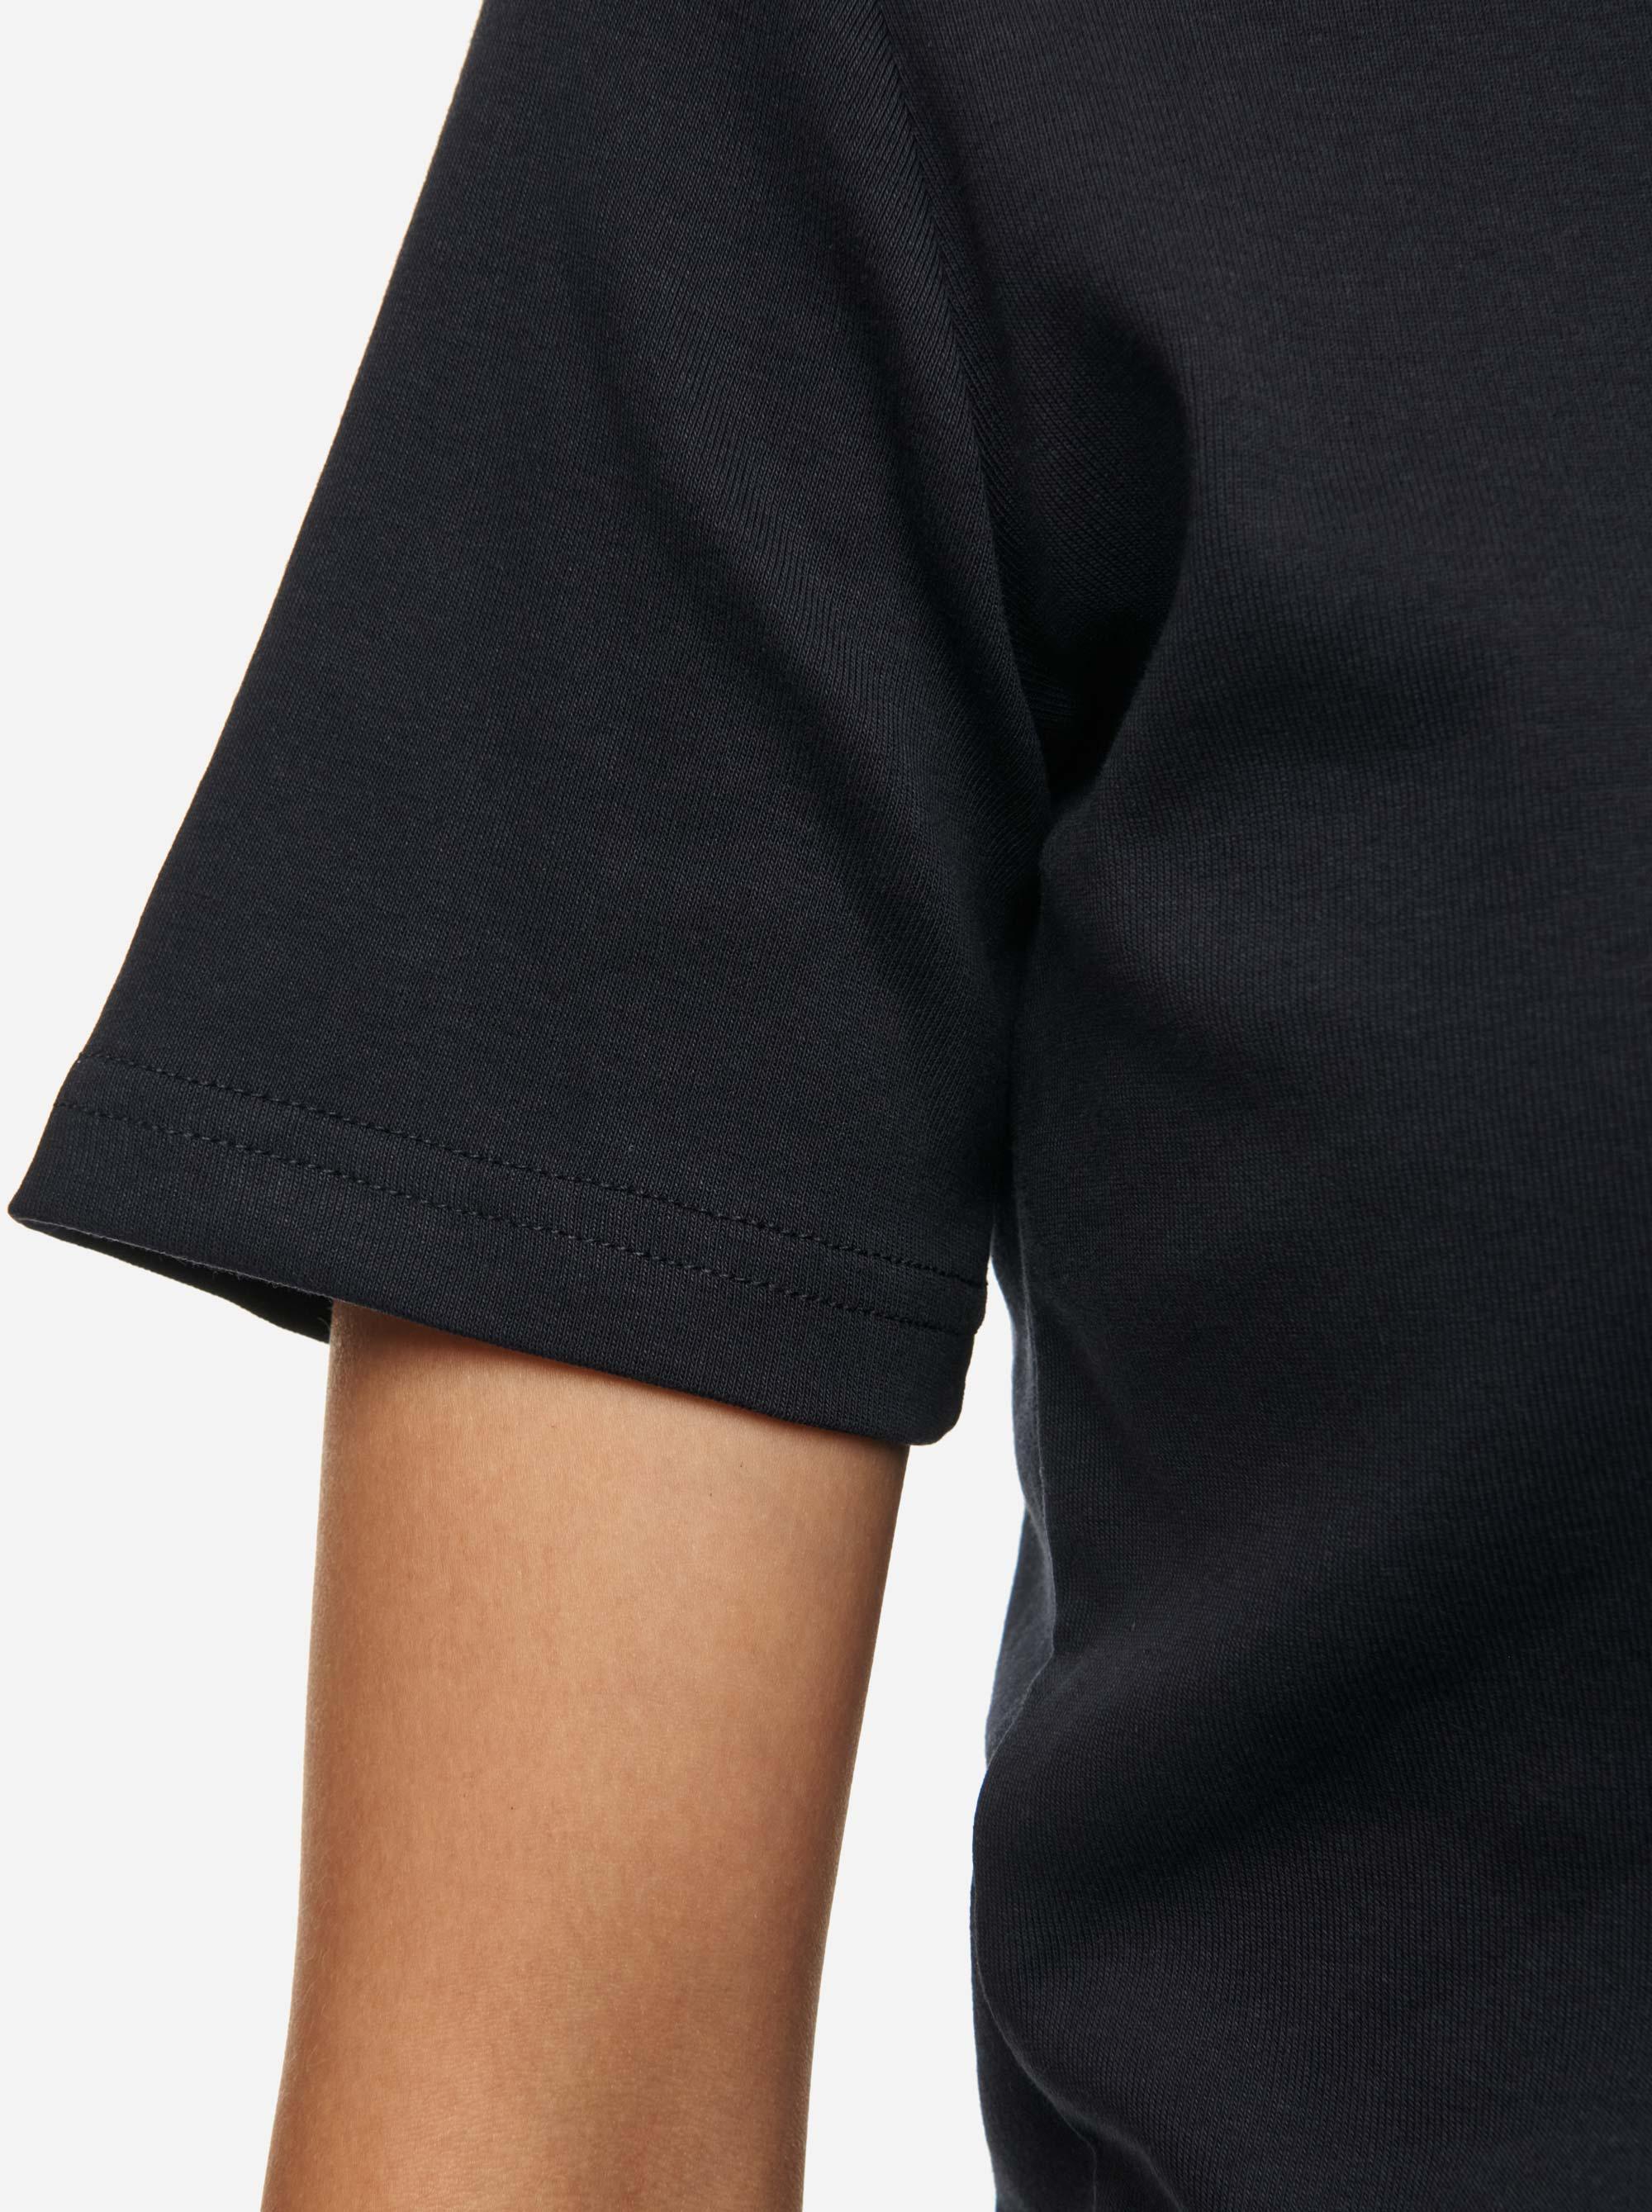 Teym - The T-Shirt - Women - Blue - 3